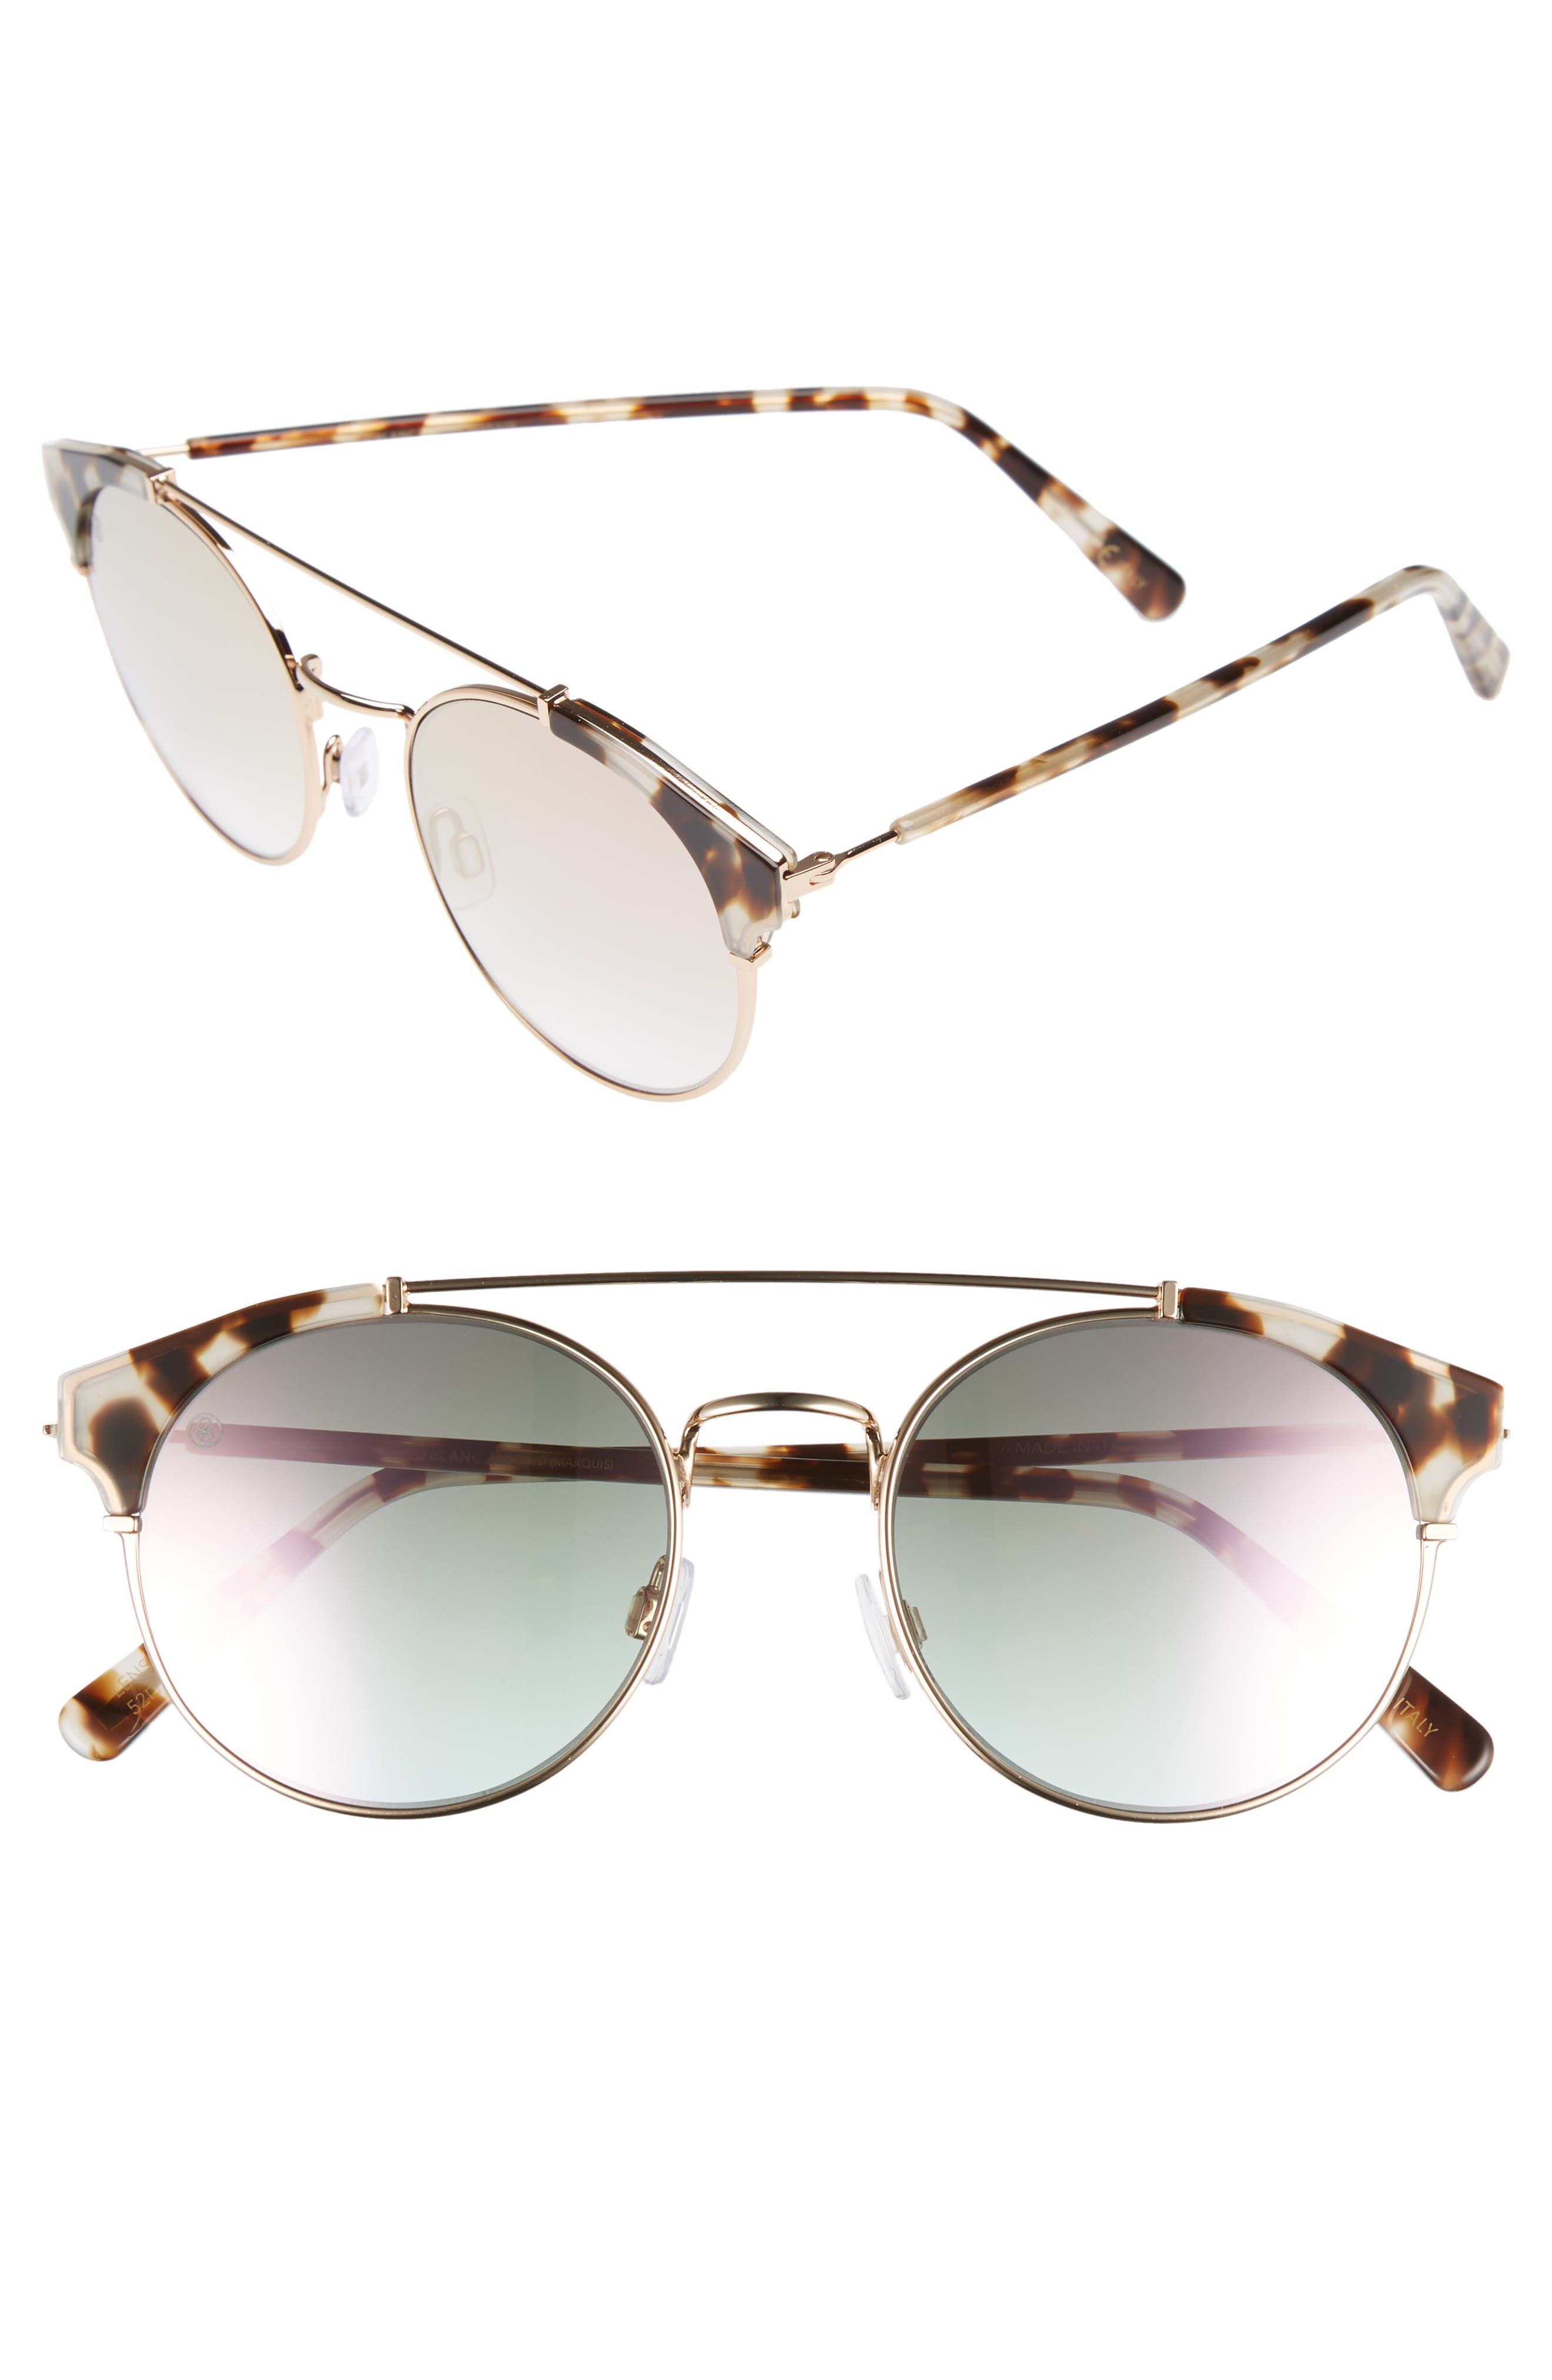 DBLANC D'BLANC x Amuse Society Dosed Marquis 52mm Gradient Round Aviator Sunglasses, Main, color, 200